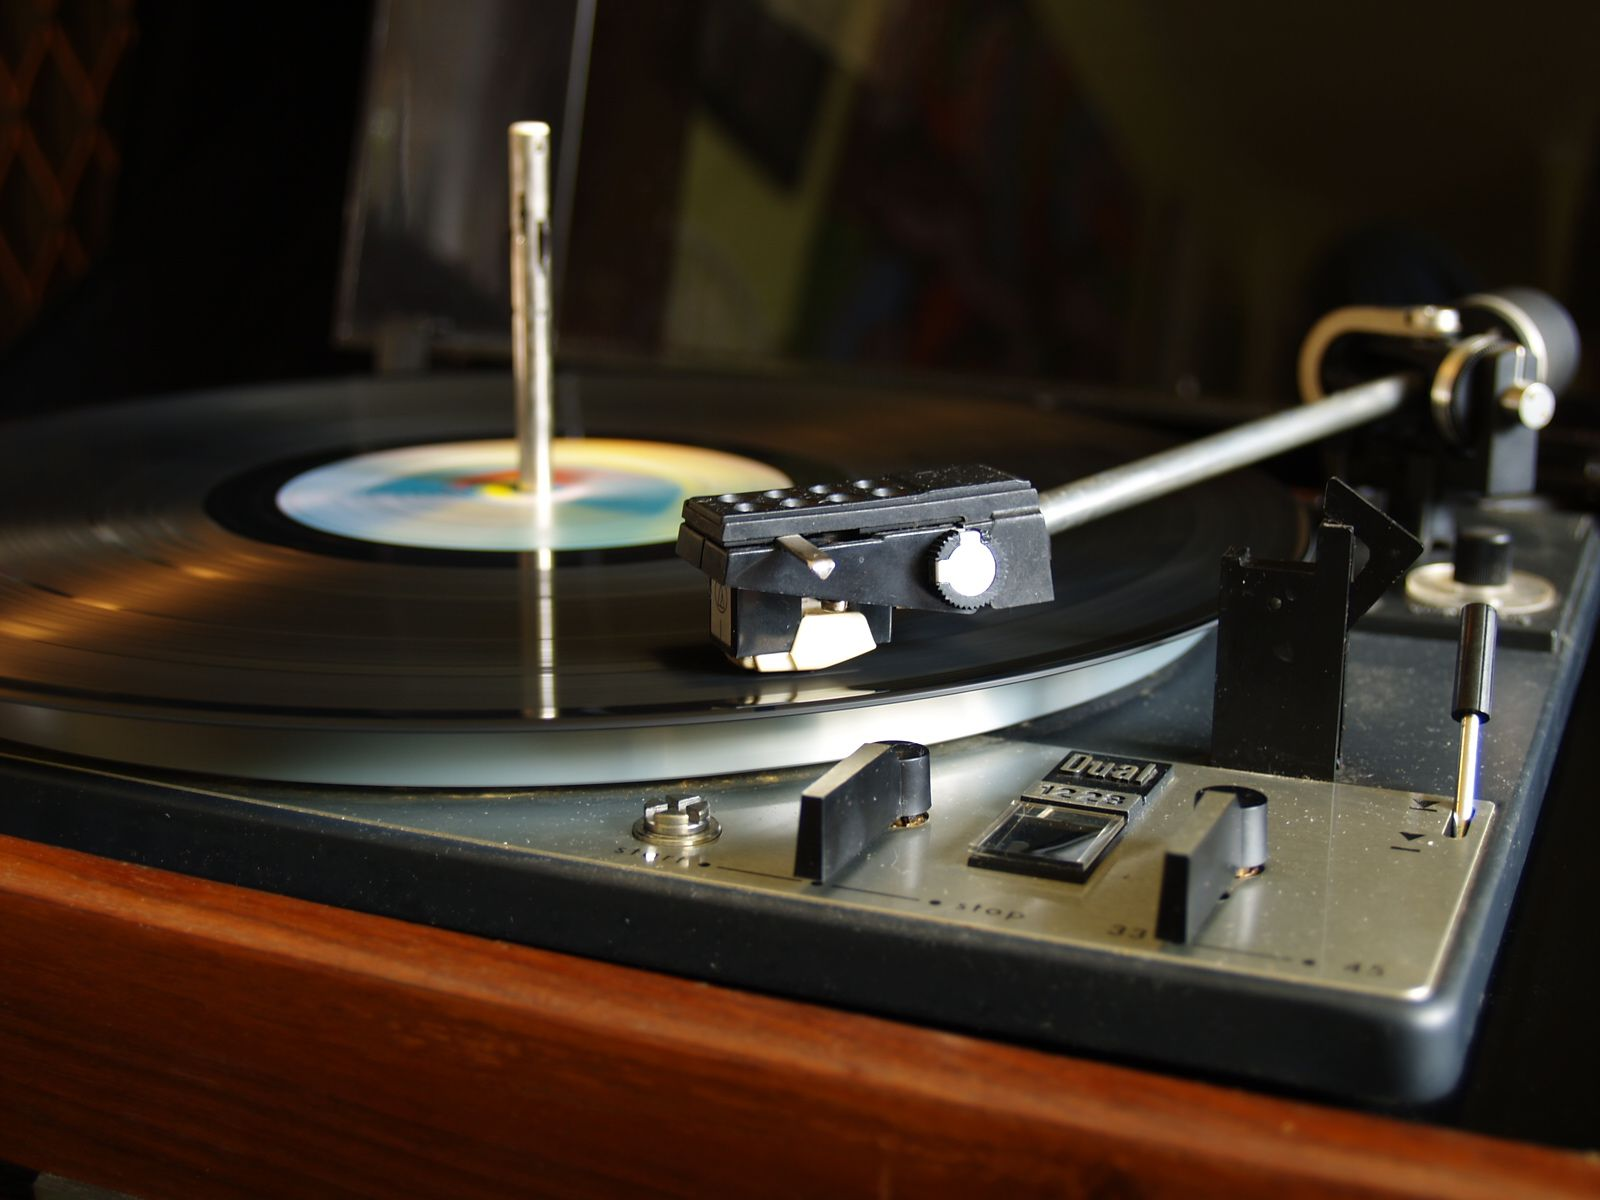 Chłodny Dual 1228 Turntable | Turntables | Turntable, Hifi audio, Record AD88